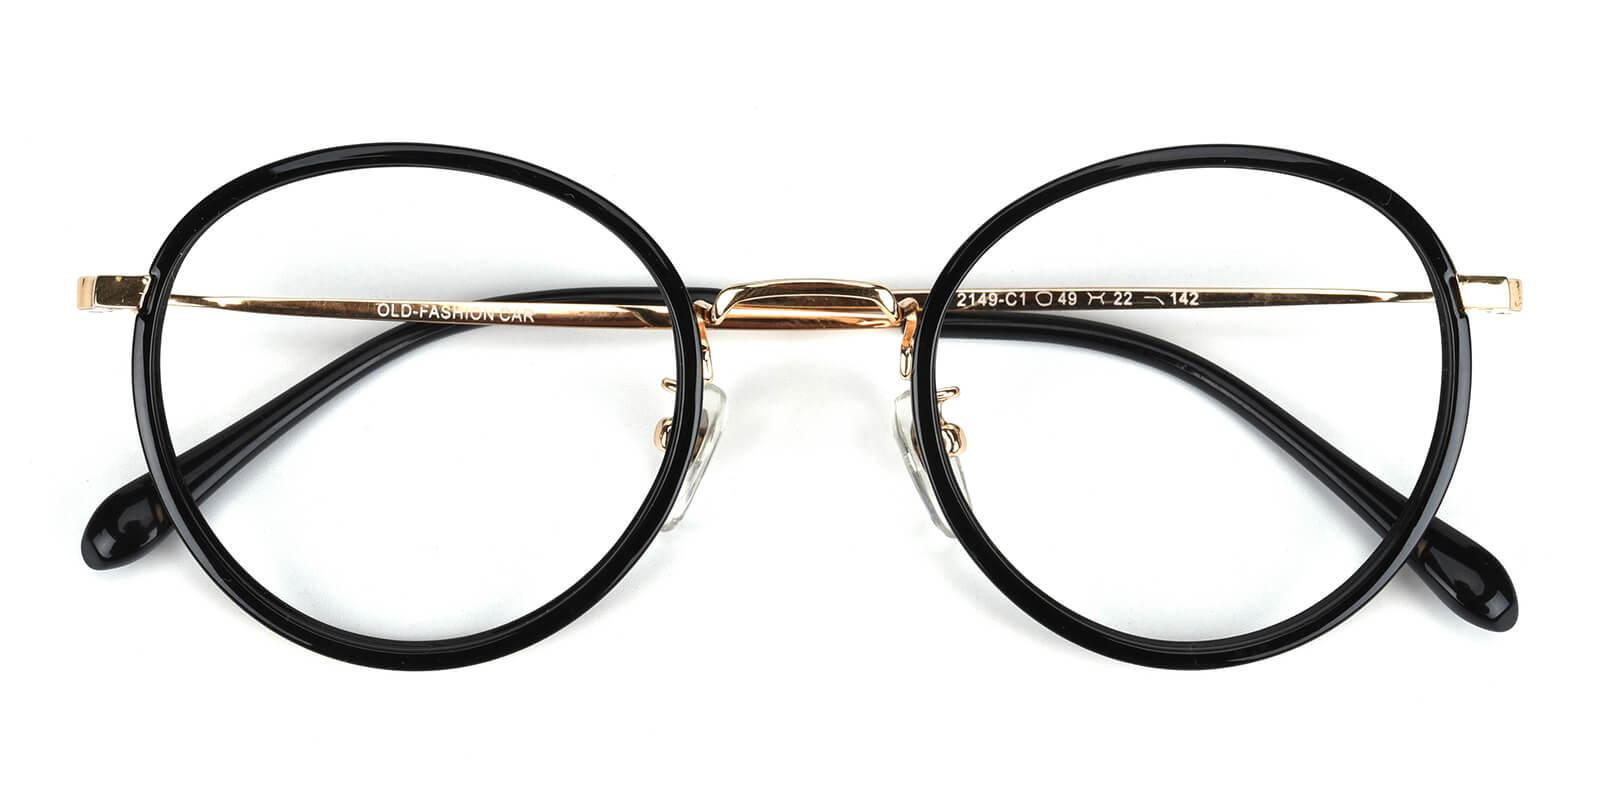 Harmt-Black-Round-Combination-Eyeglasses-detail